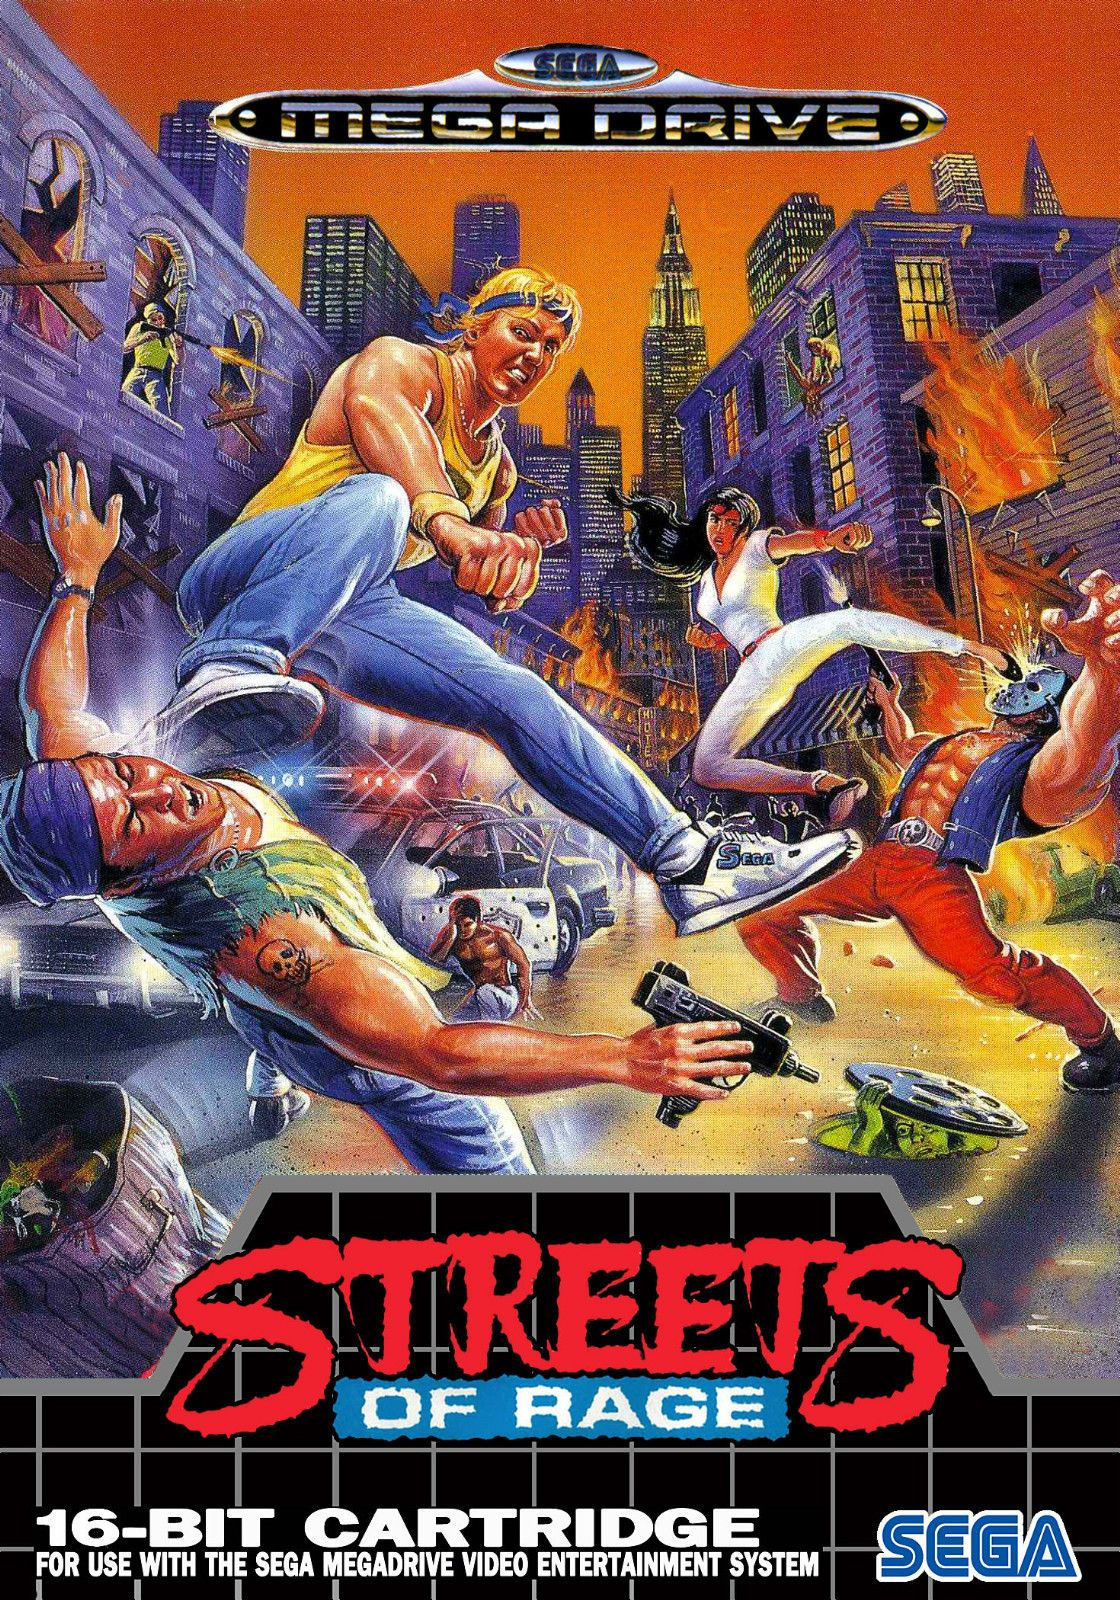 Framed Print A4 Sega Mega Drive Game Poster Streets of